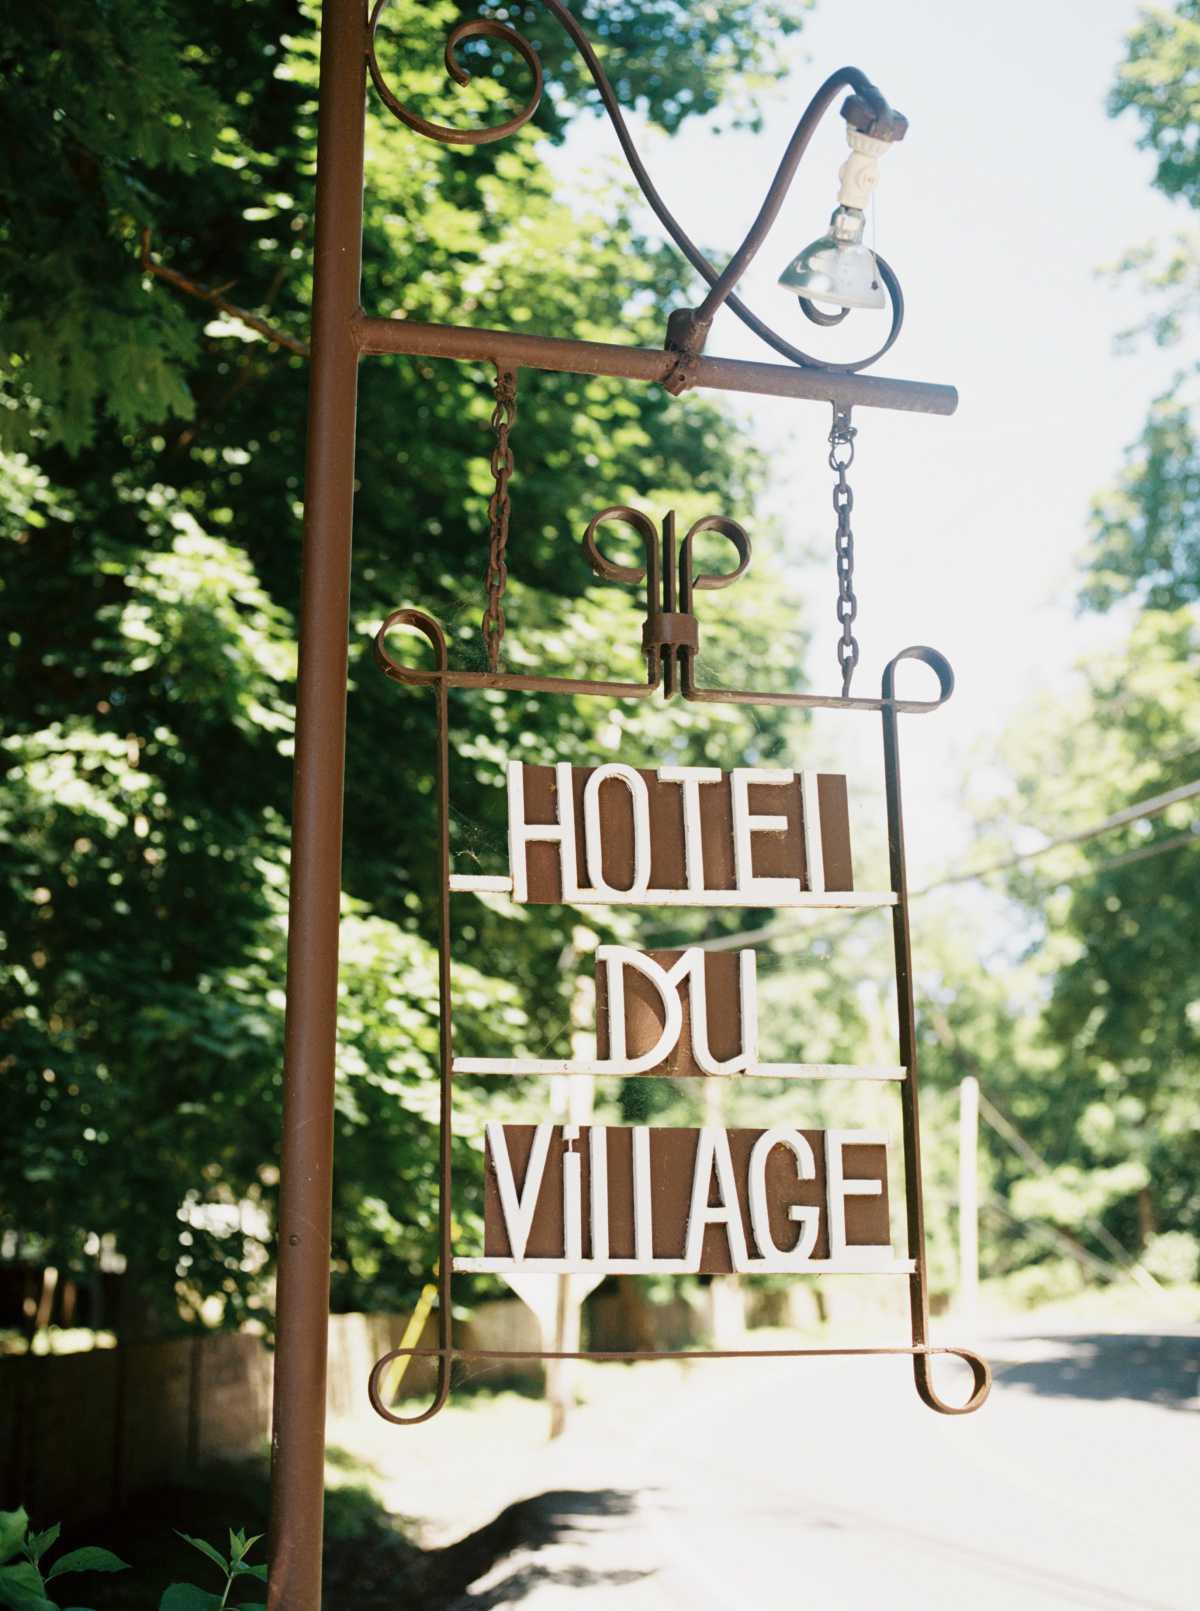 Celebrate at the Hotel Du Village